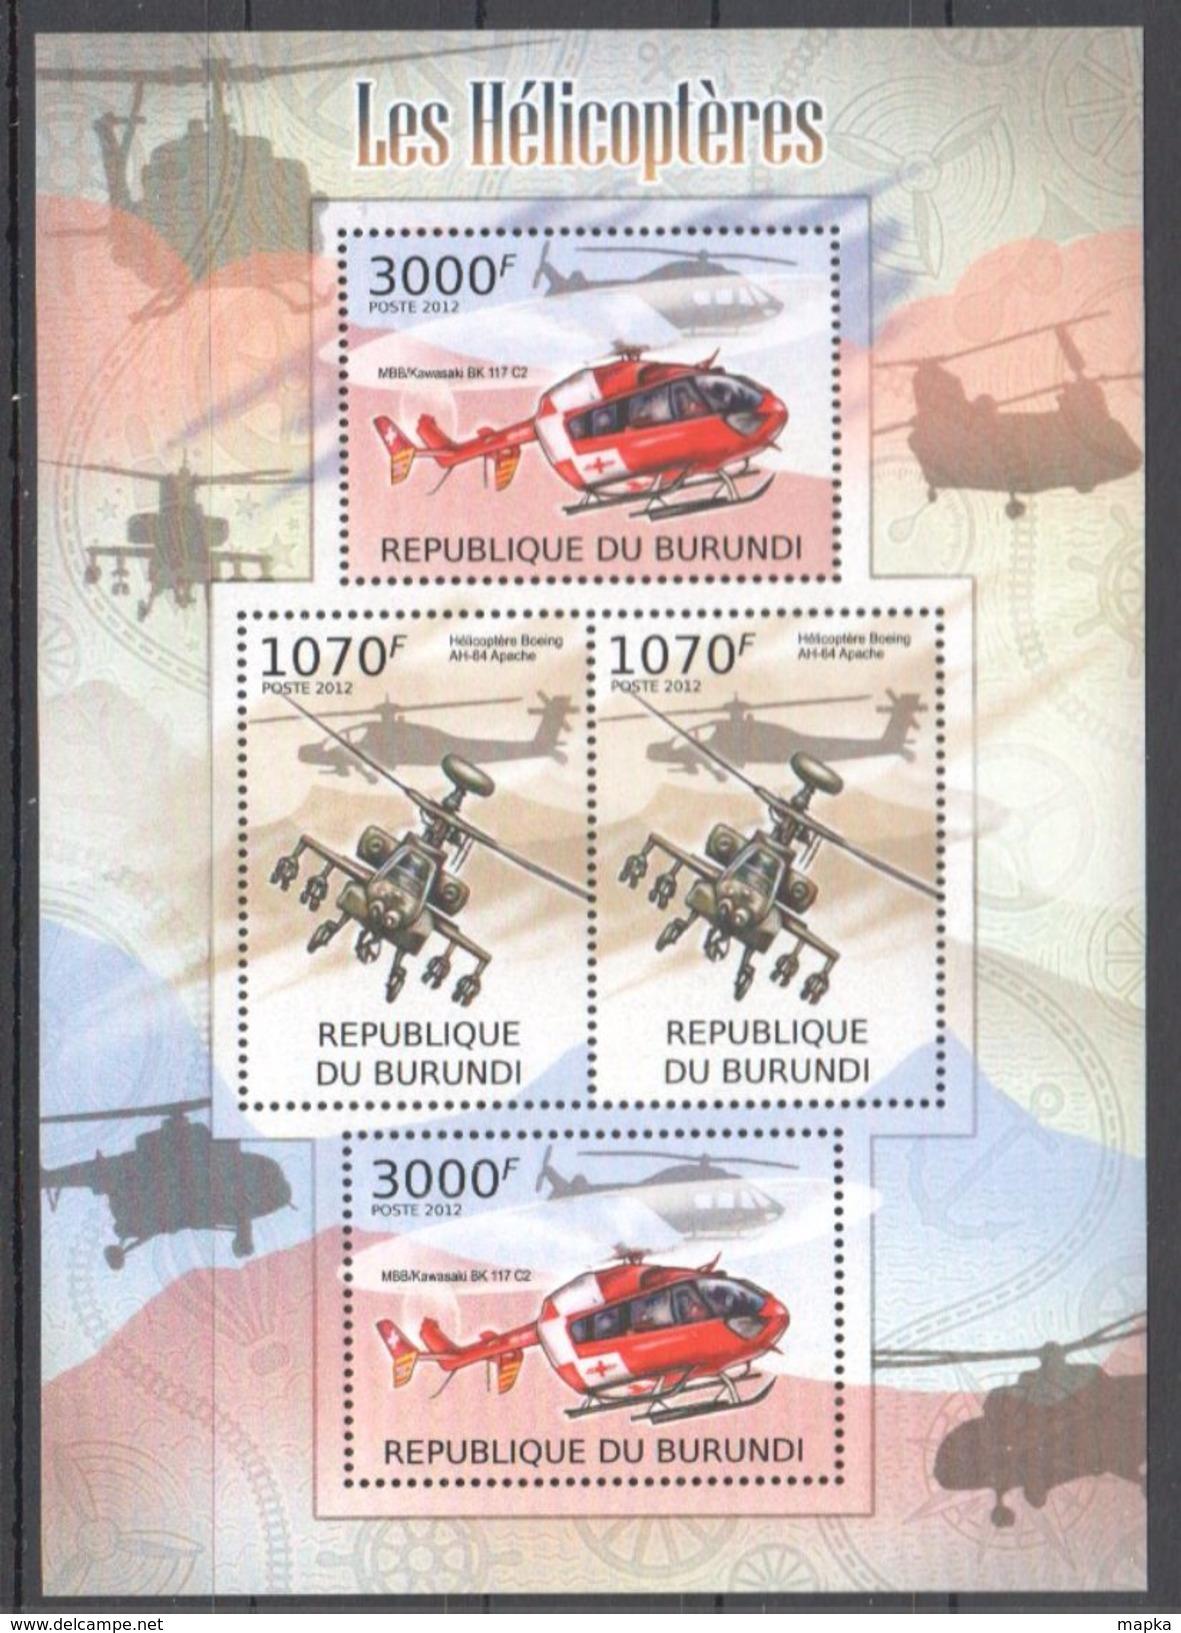 K868 2012 BURUNDI TRANSPORTATION AVIATION LES HELICOPTERES 1KB MNH - Hélicoptères